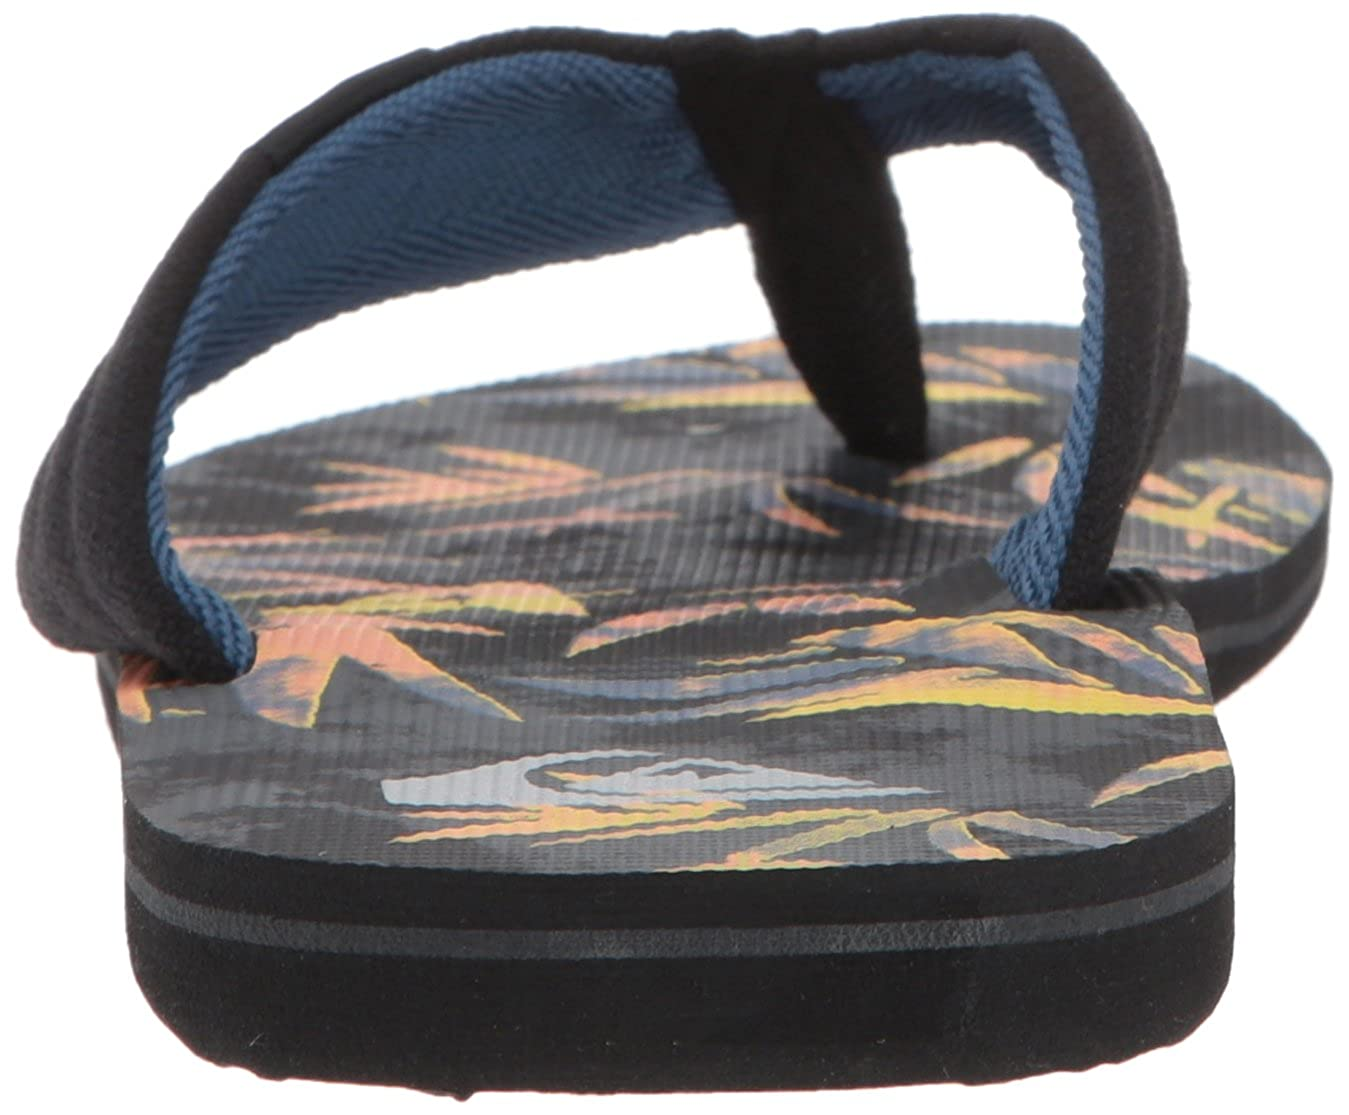 509f963fcb28f Quiksilver Men s Molokai Layback Sandal